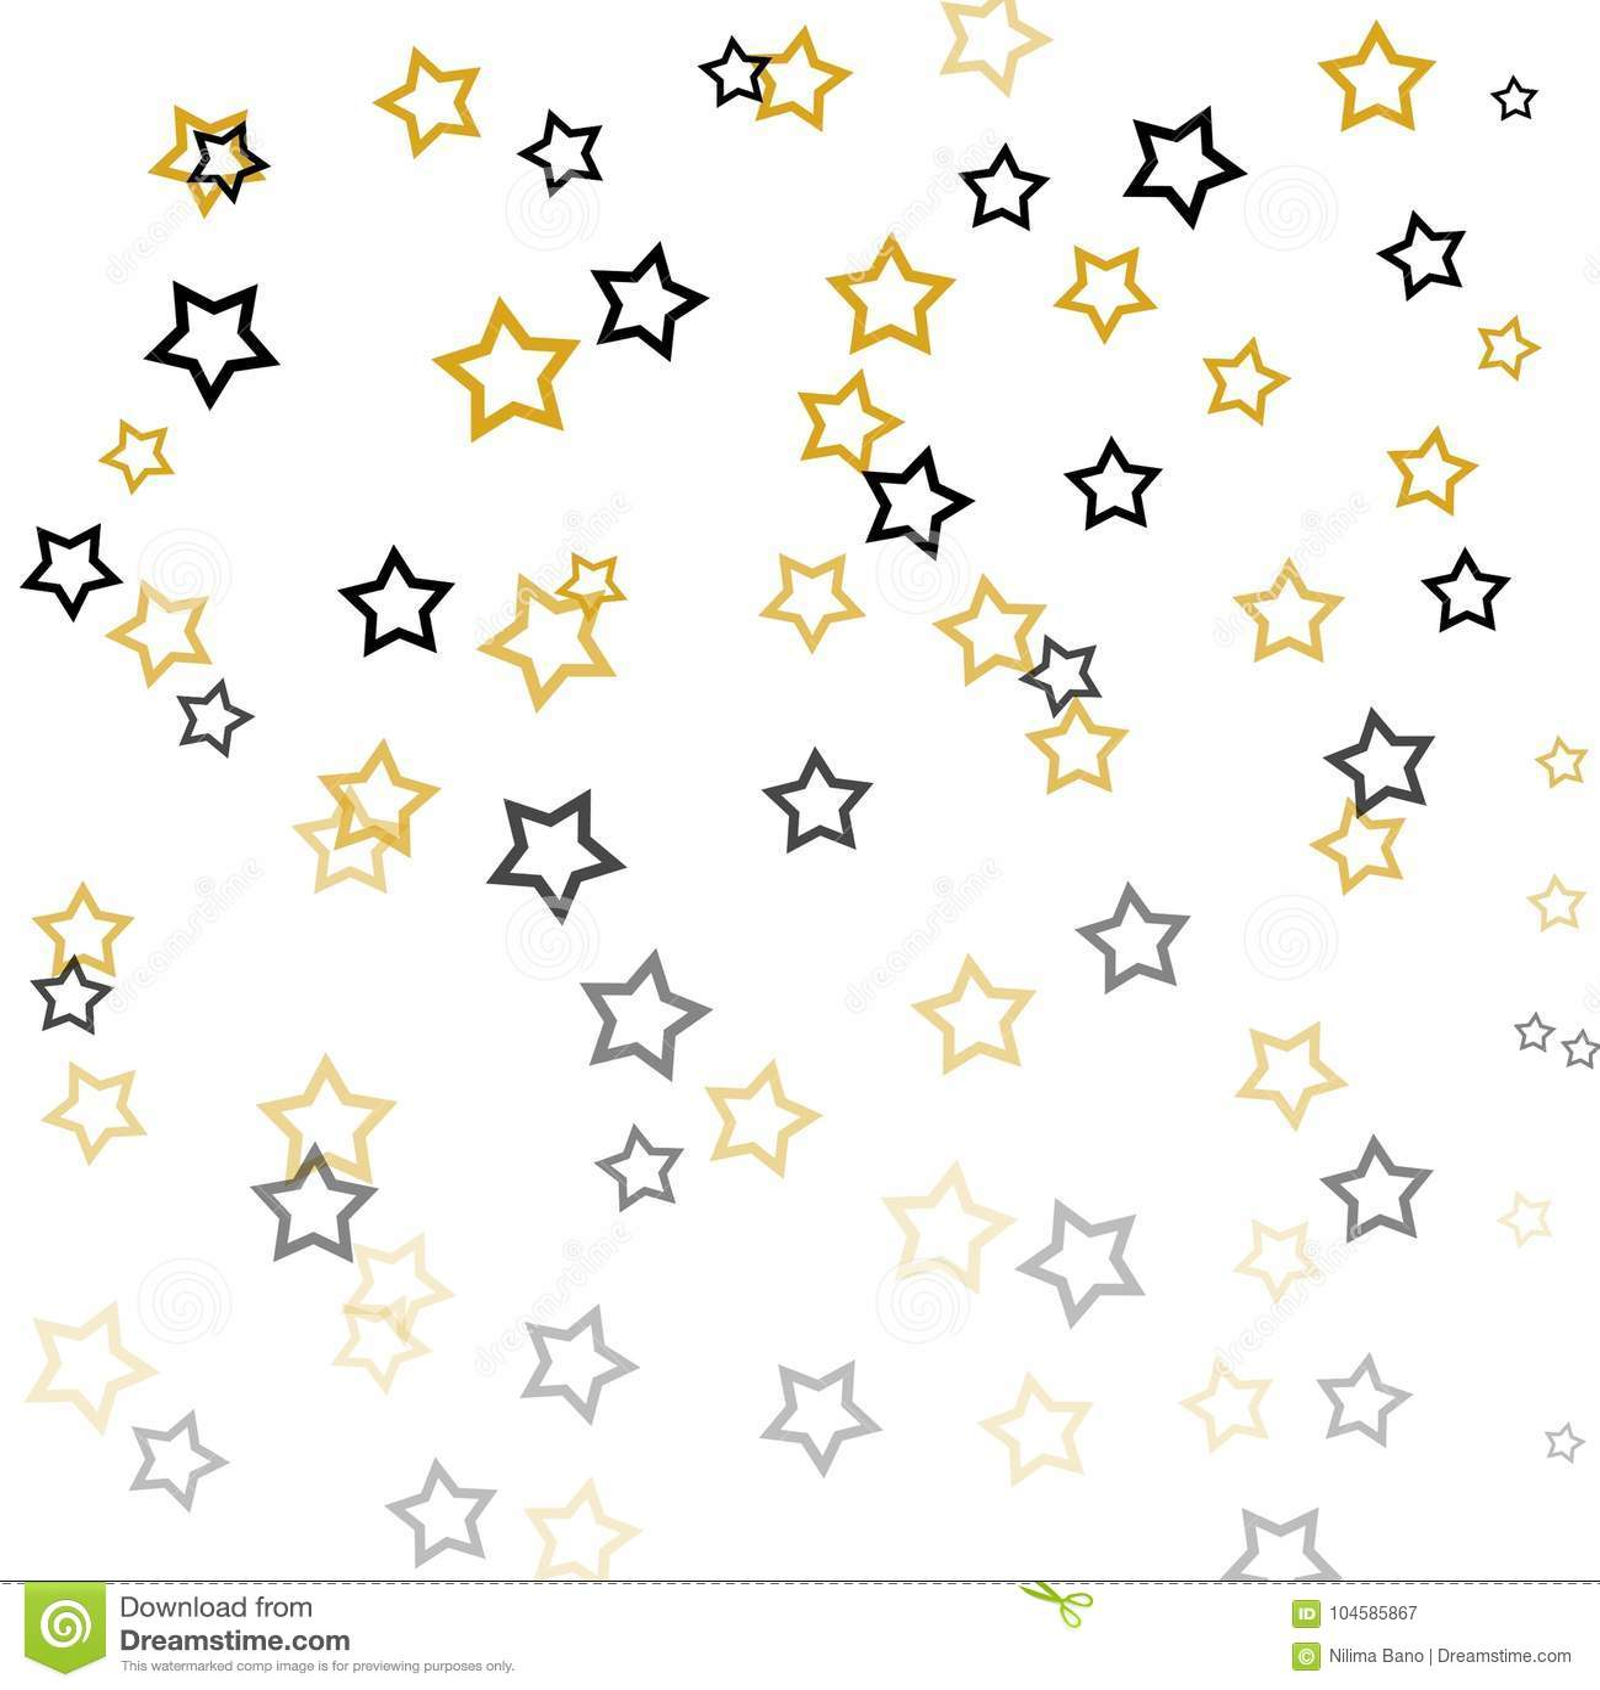 Stars Illustration On White Background Stock Illustration